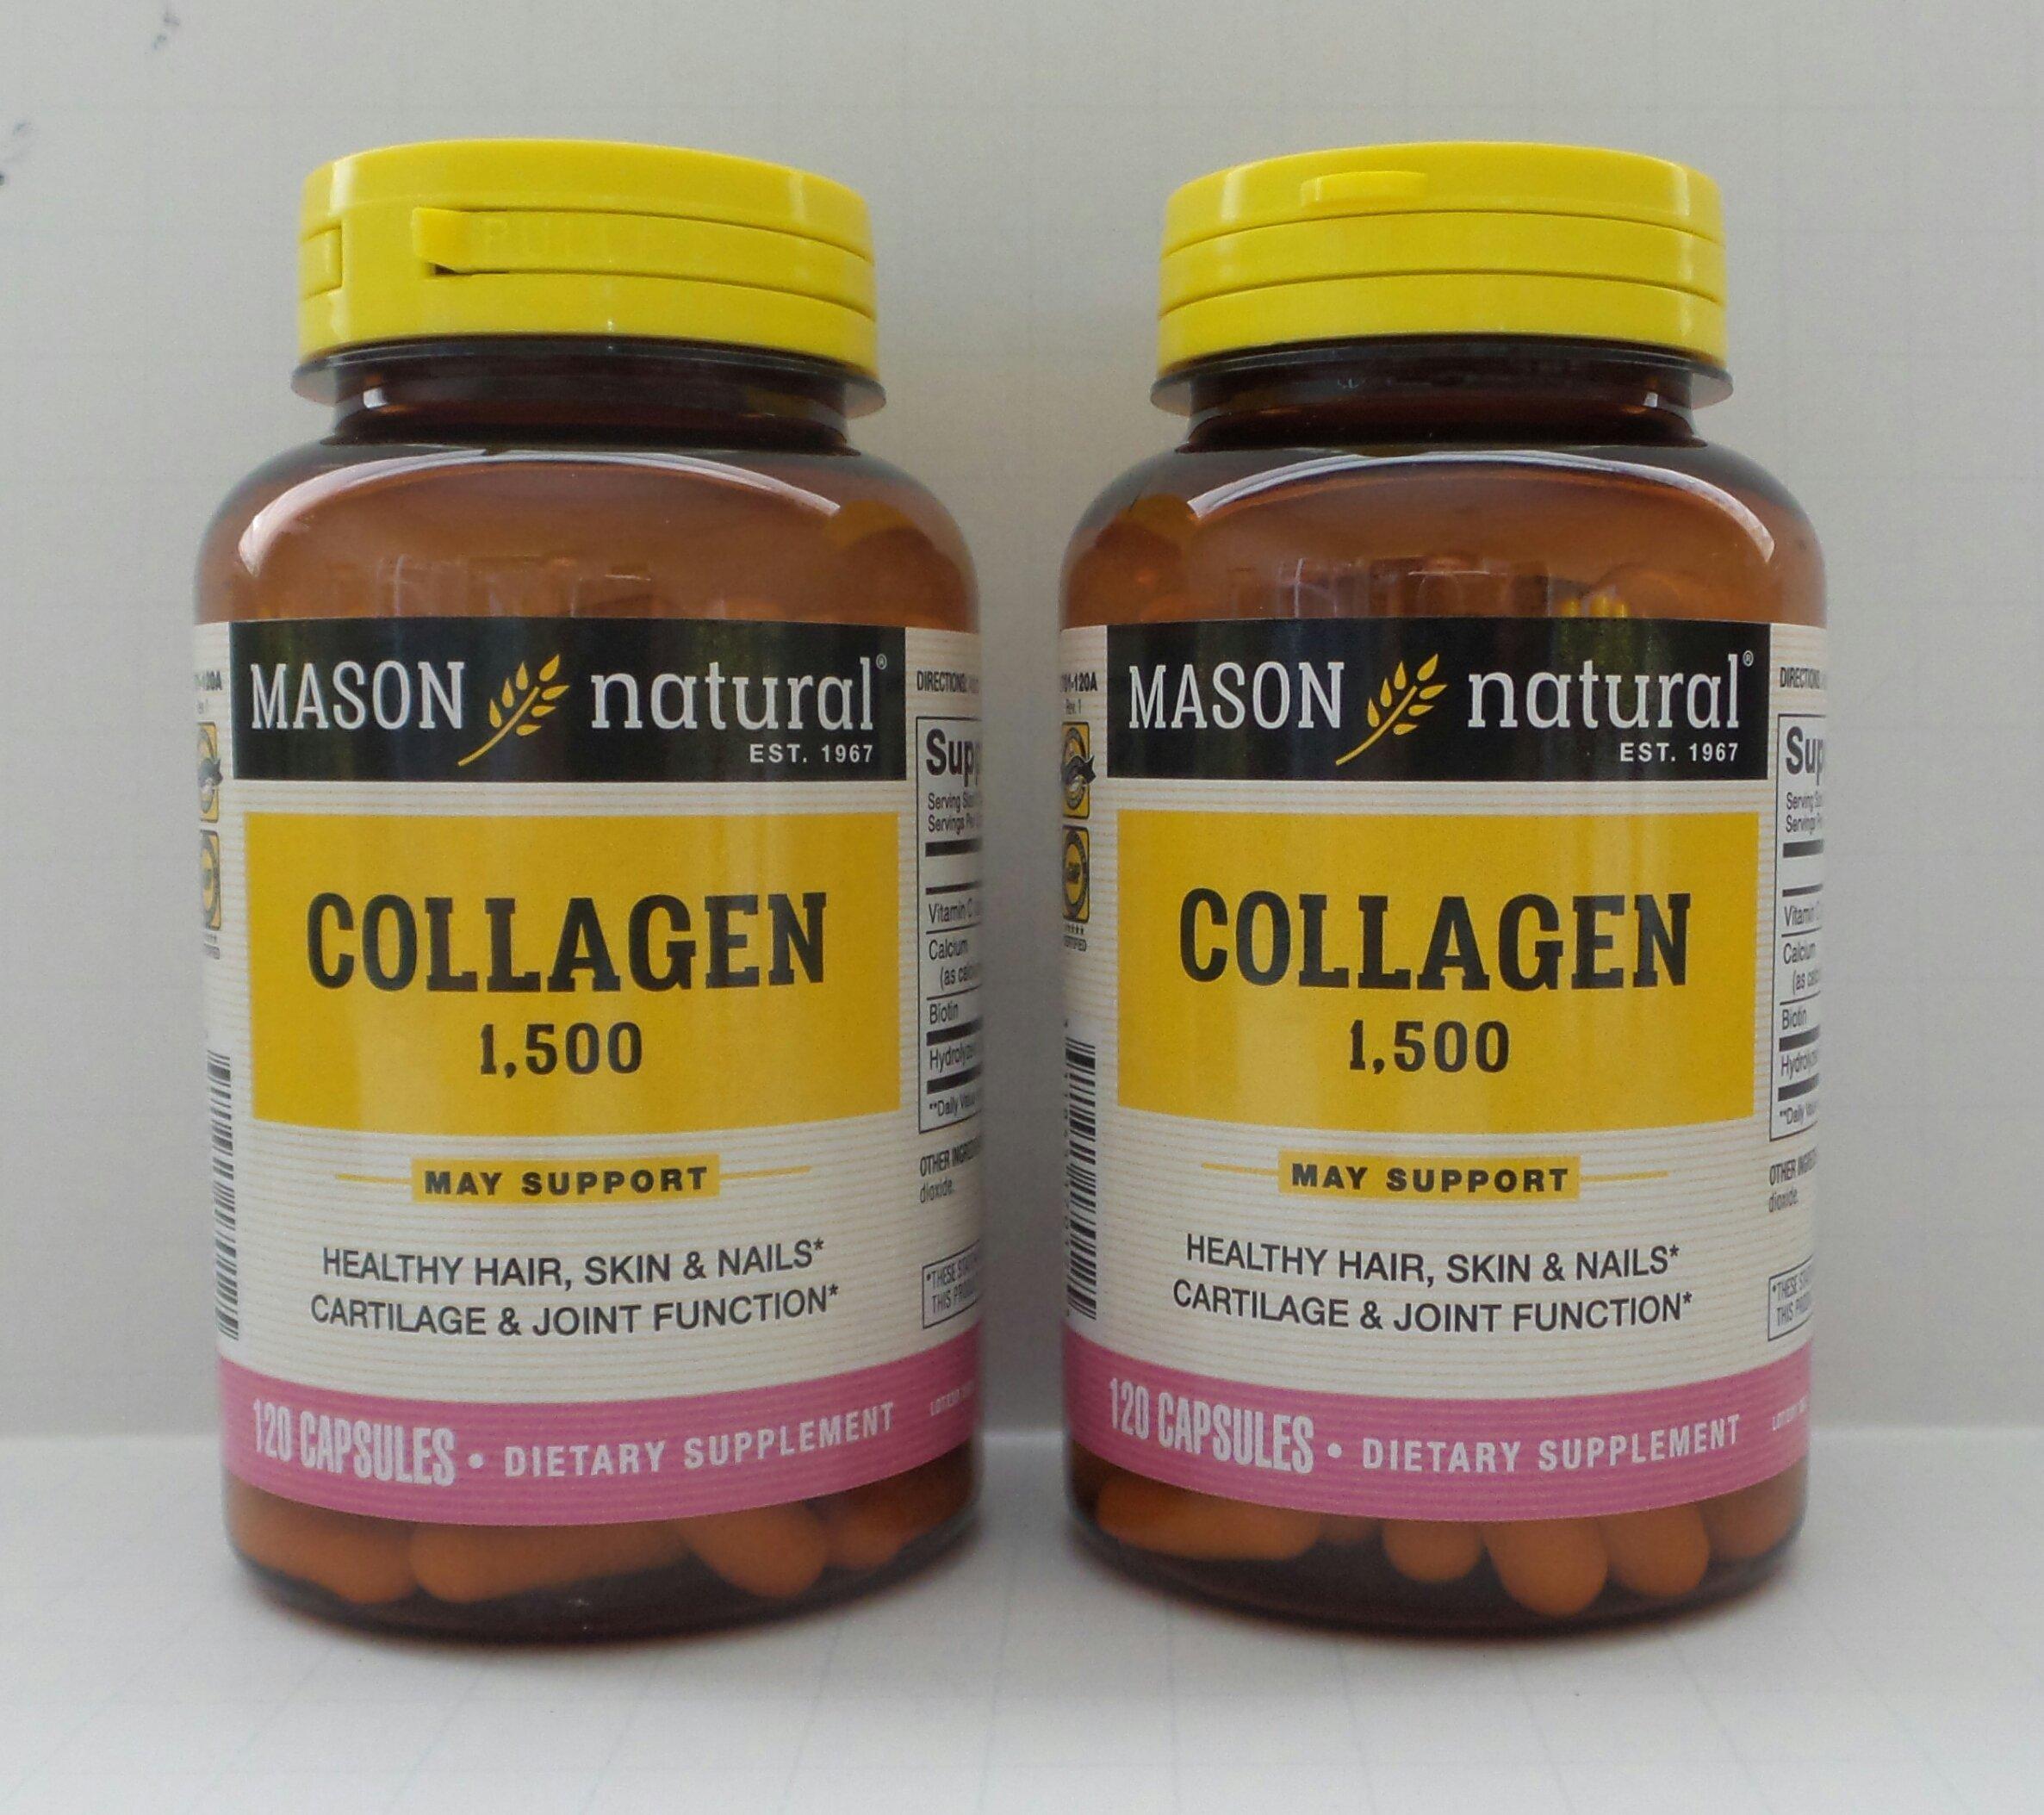 Mason Natural Collagen plus Vitamin C, 1500 mg, 120 Capsules (Pack of 2) by Mason Natural